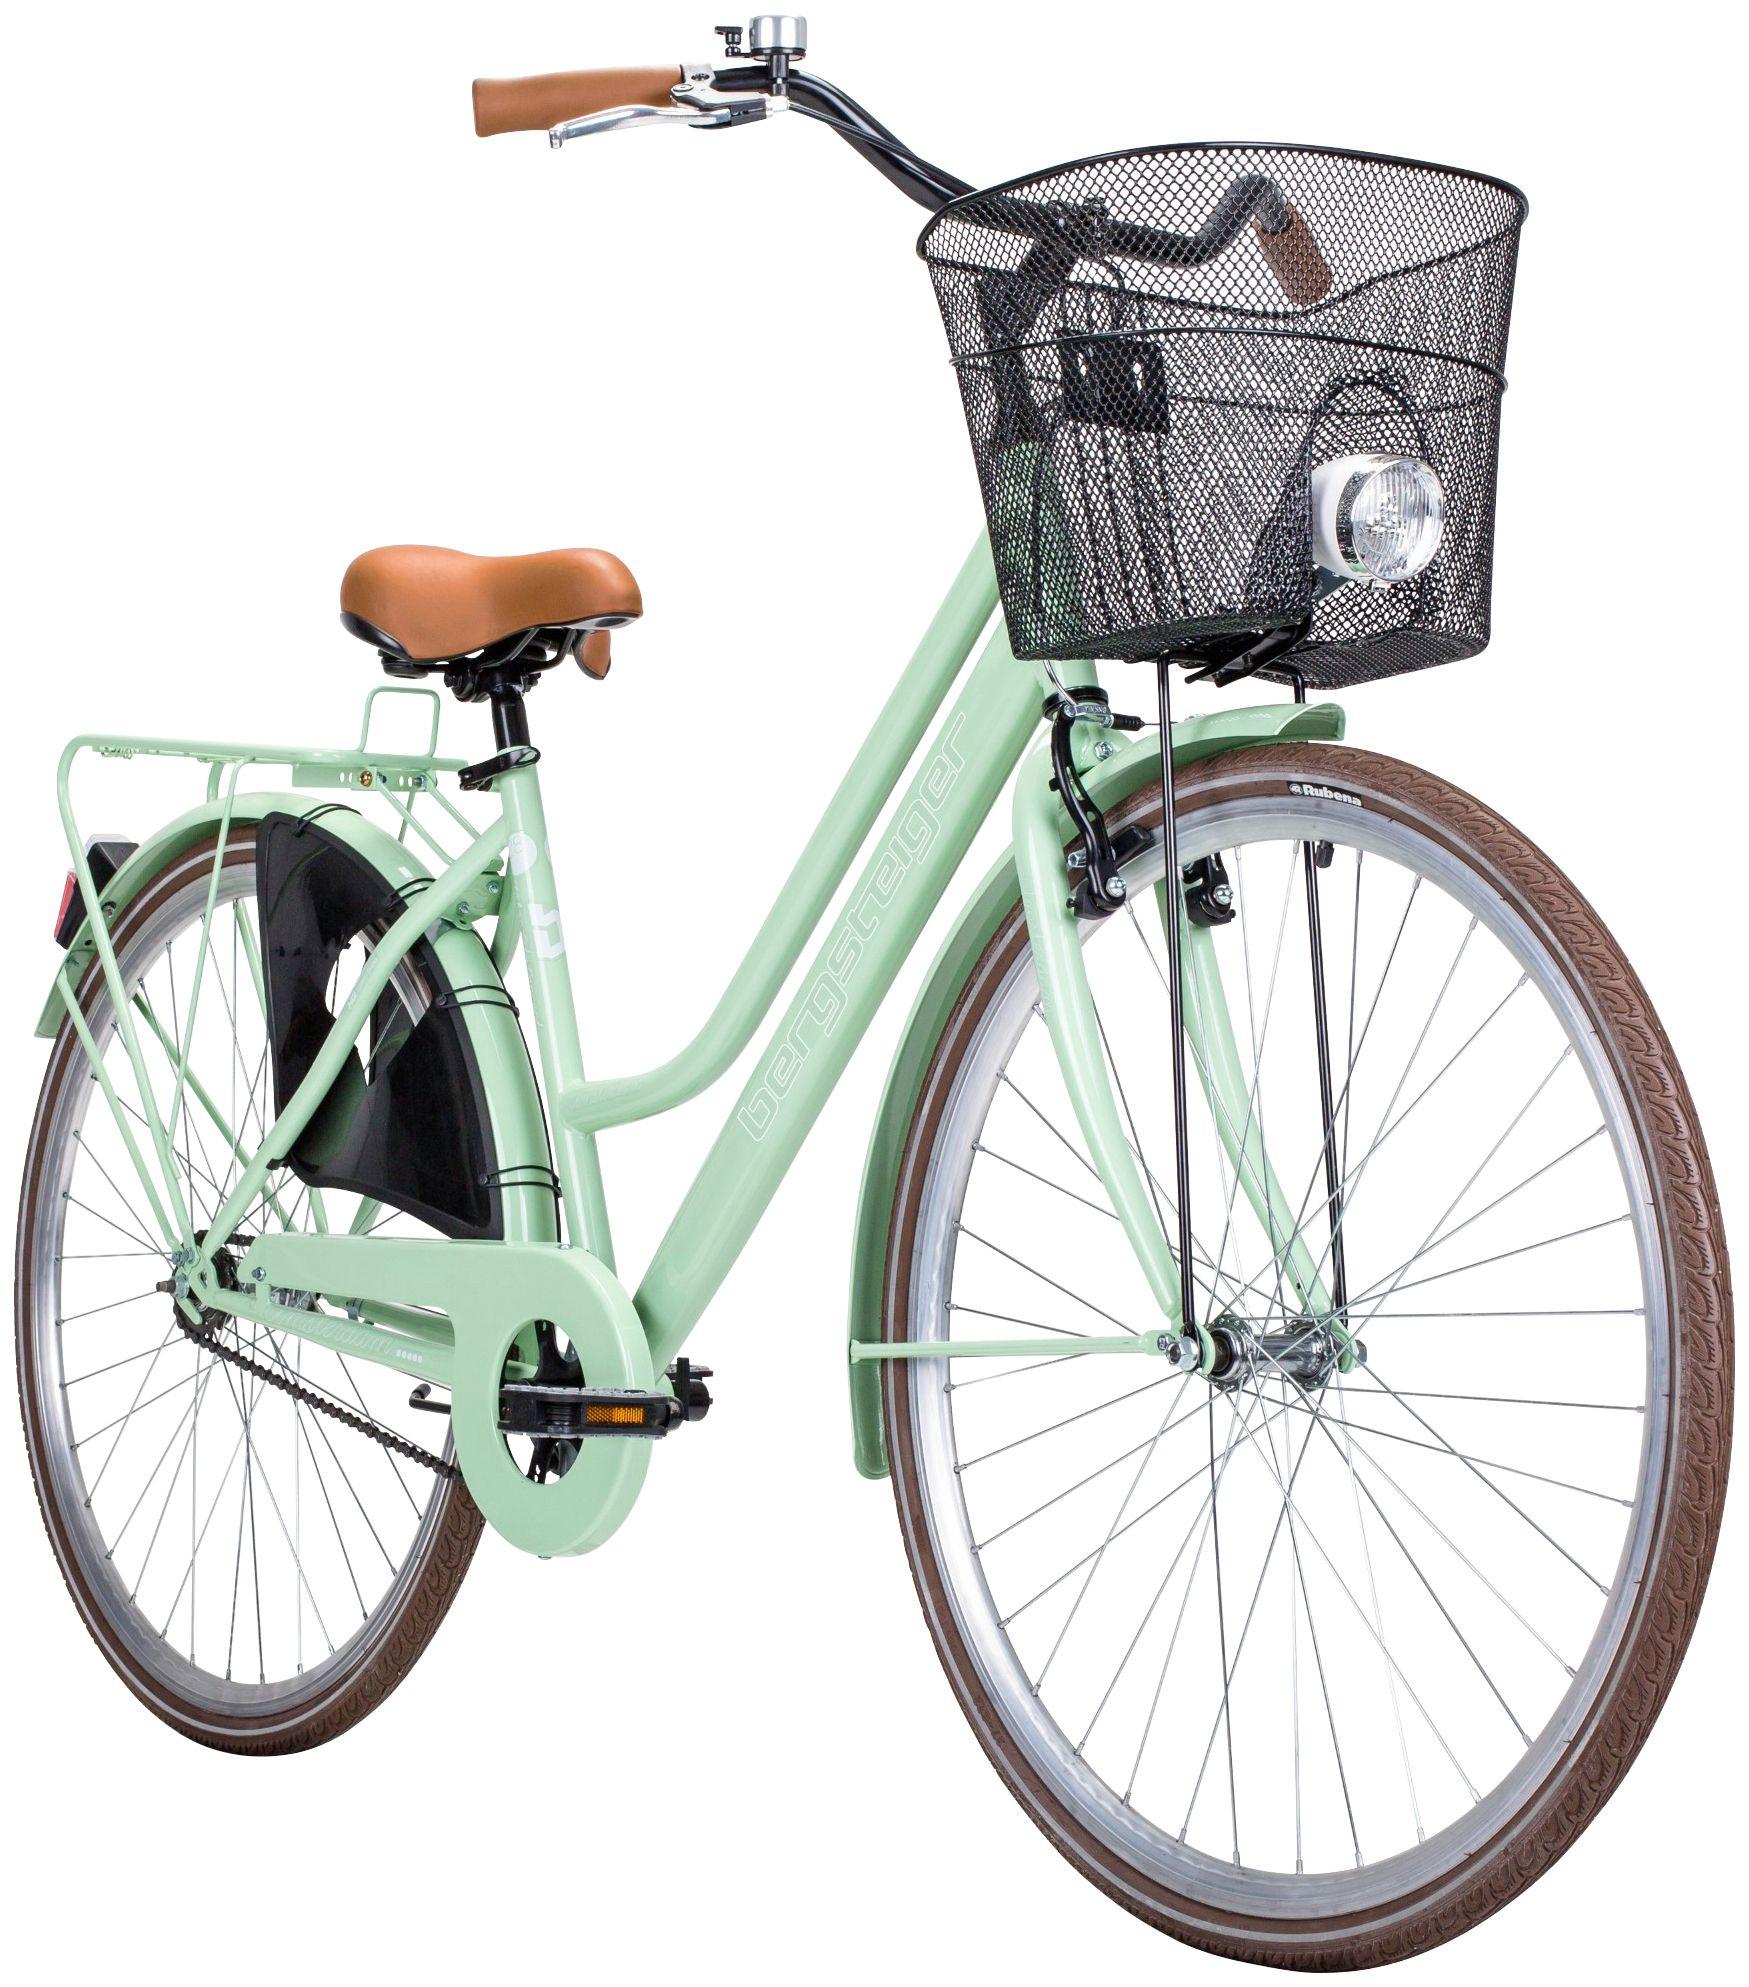 BERGSTEIGER  Citybike Damen »Amsterdam«, 28 Zoll, 1 Gang, V-Bremsen